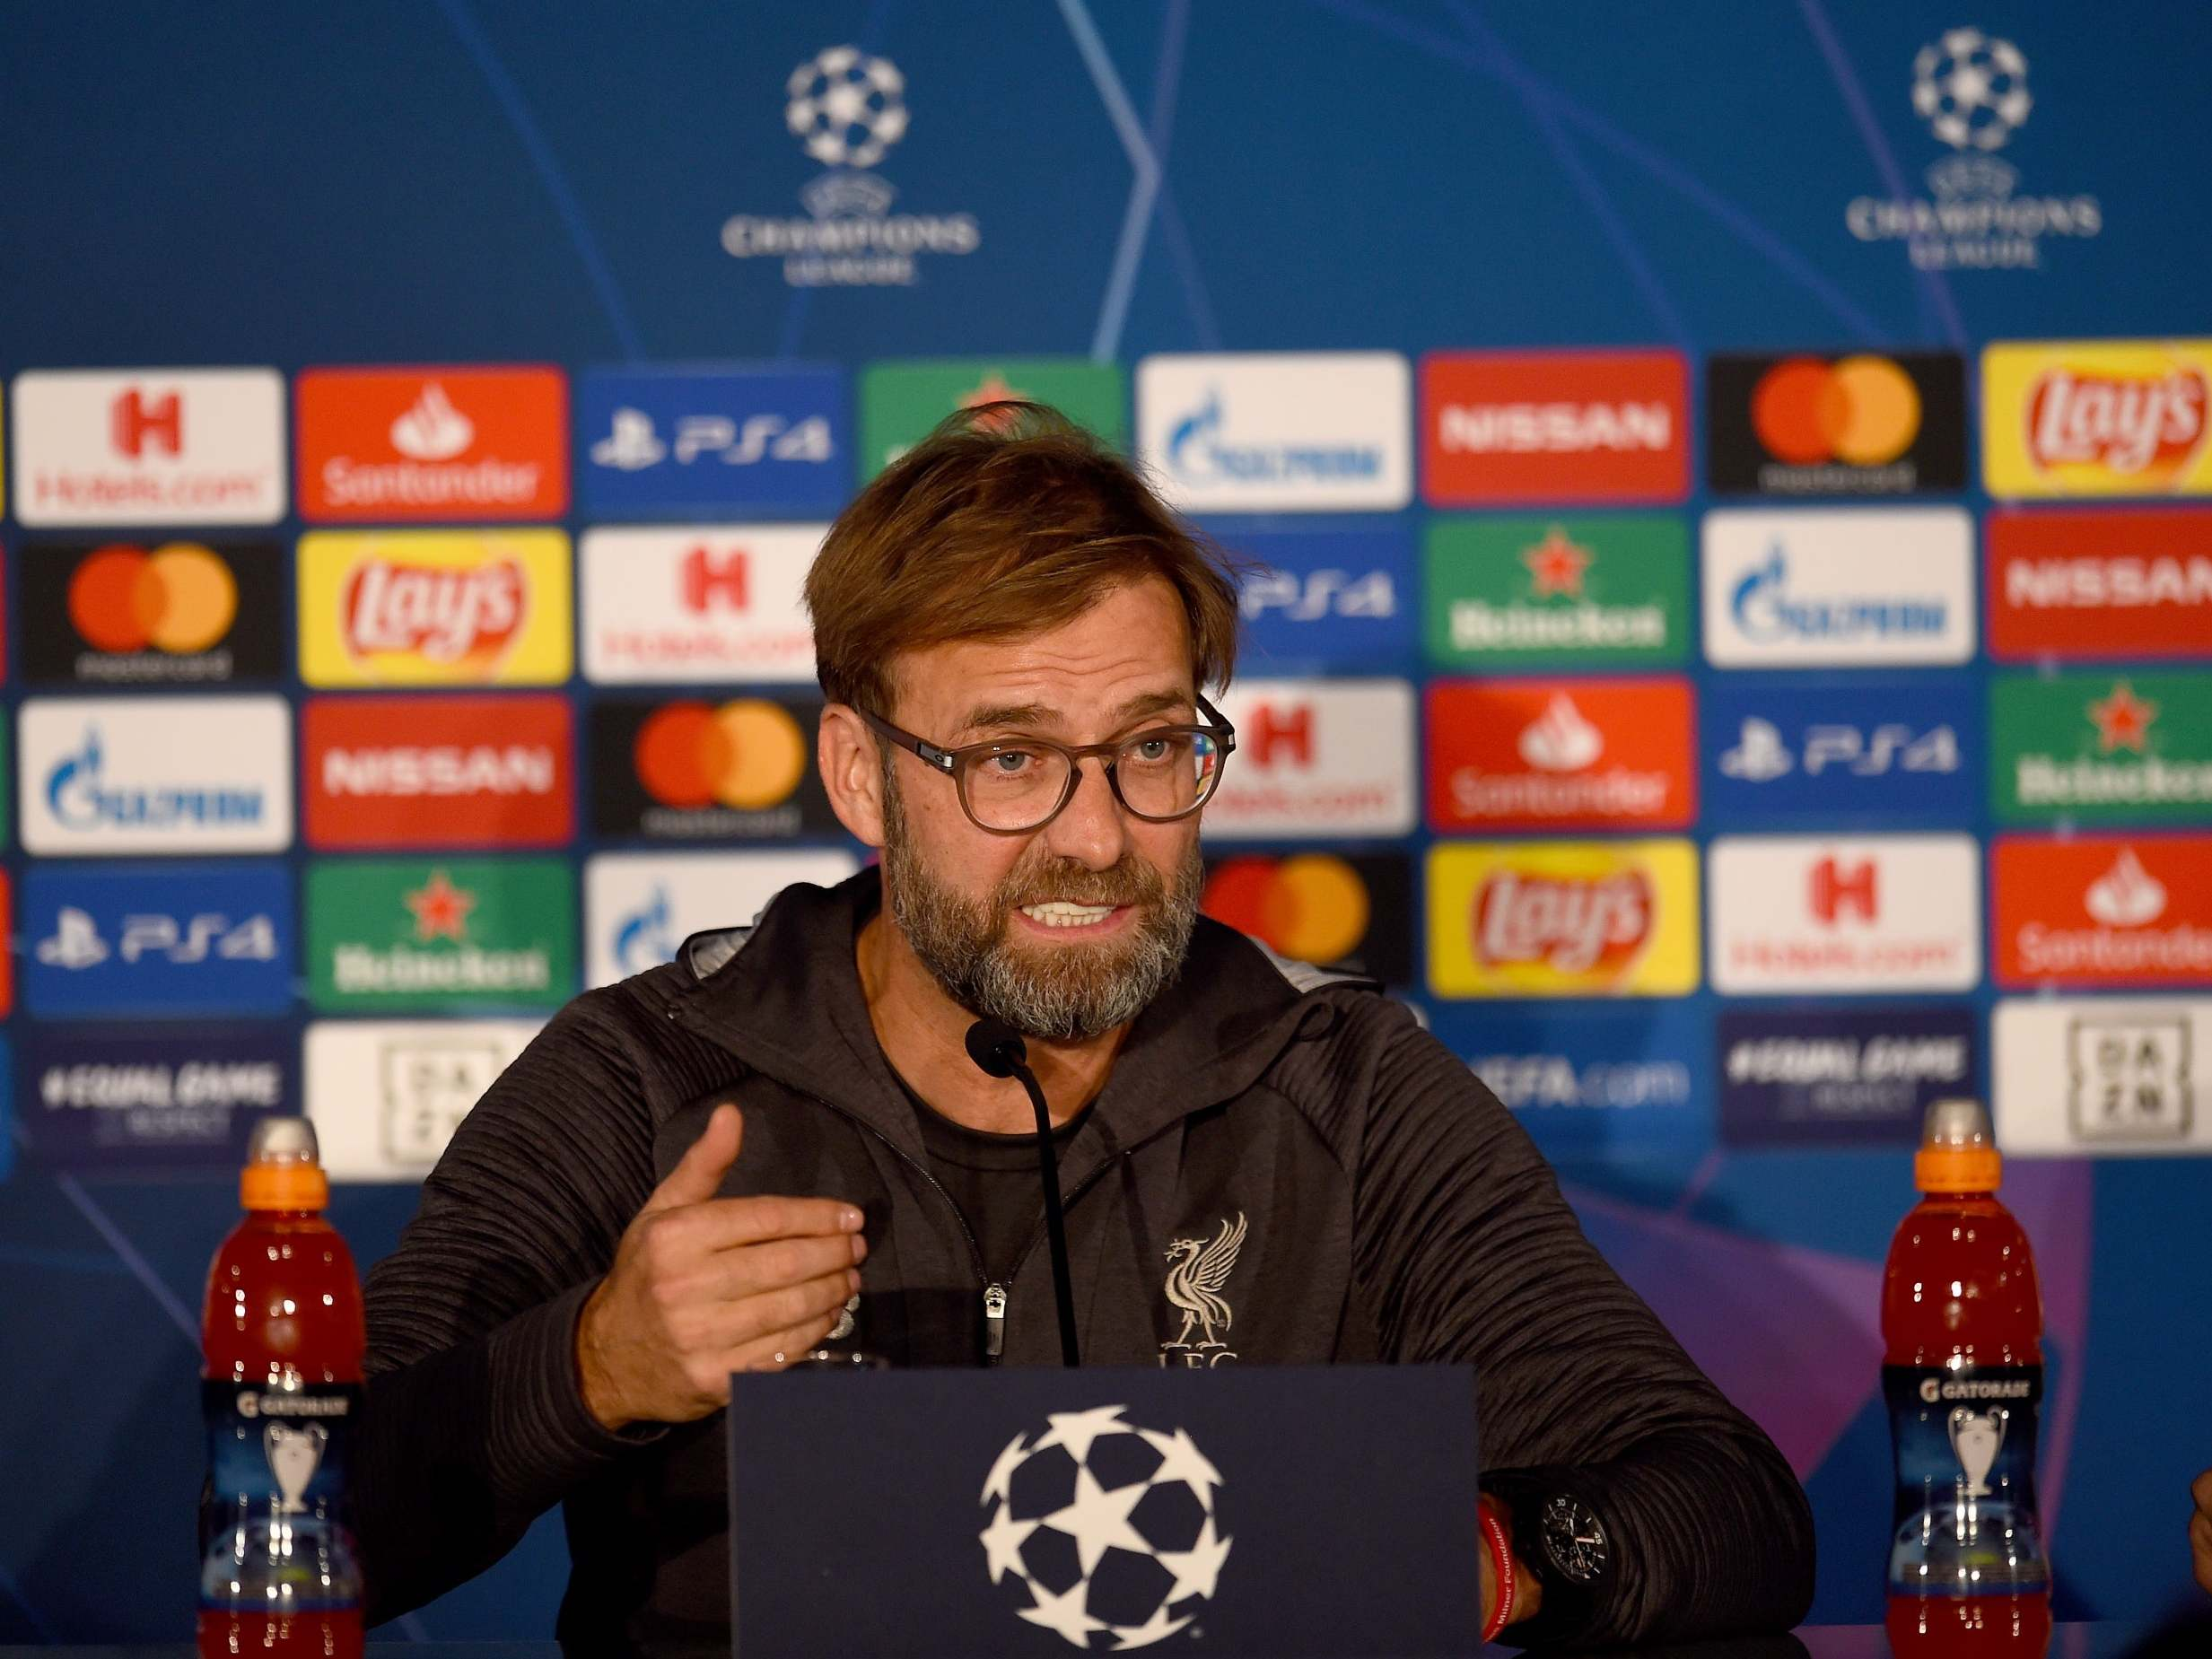 Salzburg vs Liverpool: Jurgen Klopp confident over 'intense period' ahead of crucial Champions League game